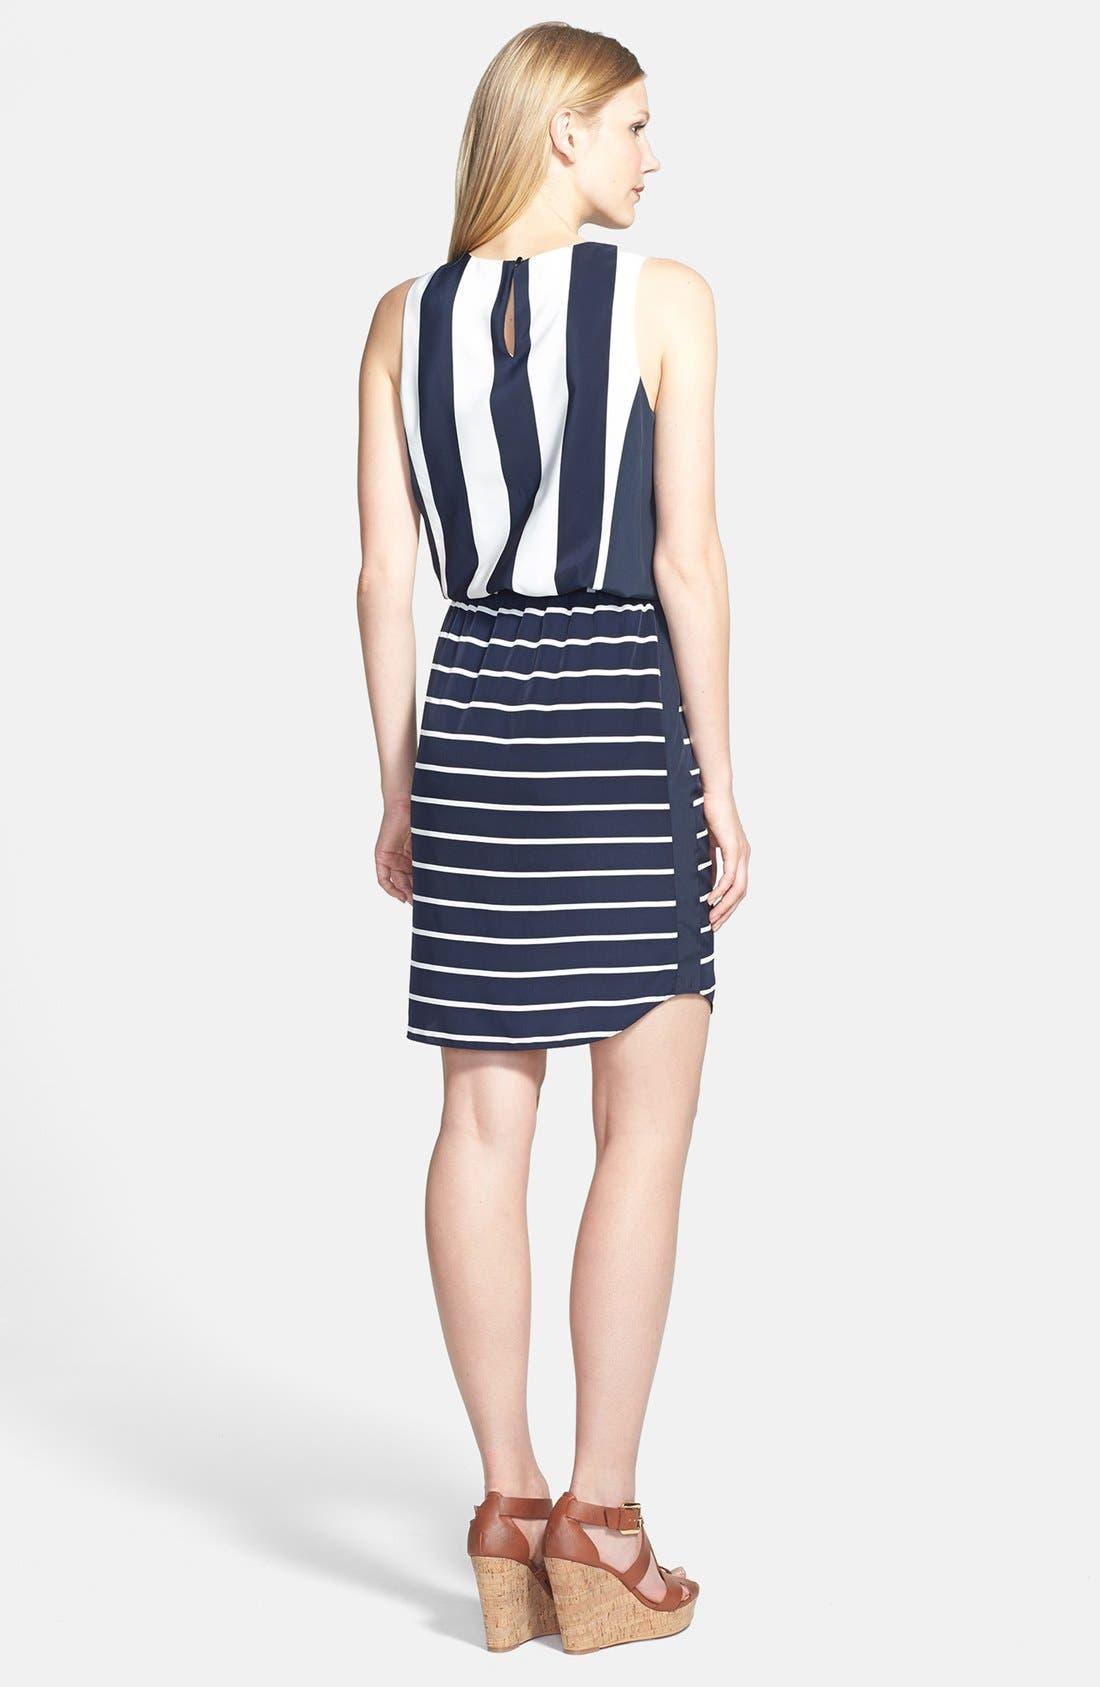 Alternate Image 2  - Vince Camuto 'Yacht Stripe' Mixed Print Dress (Regular & Petite)